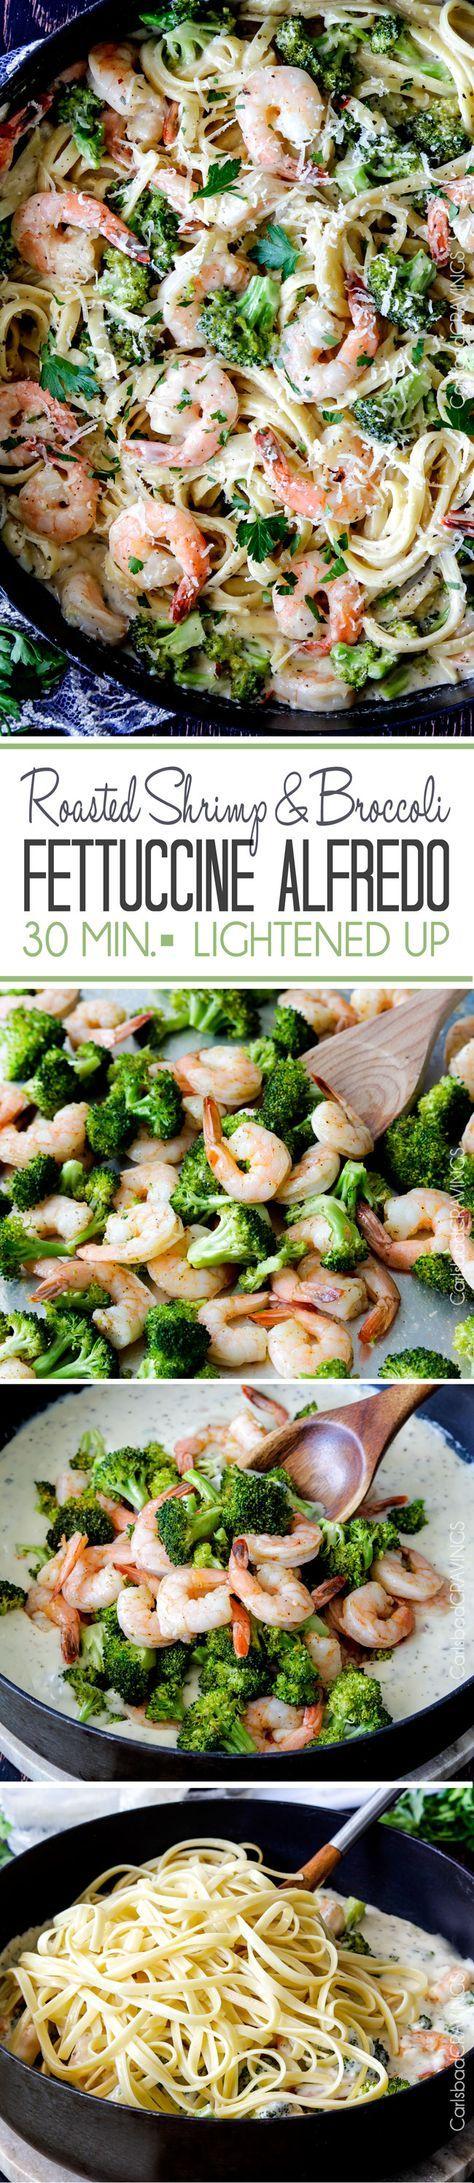 25+ best ideas about Shrimp fettuccine on Pinterest ...